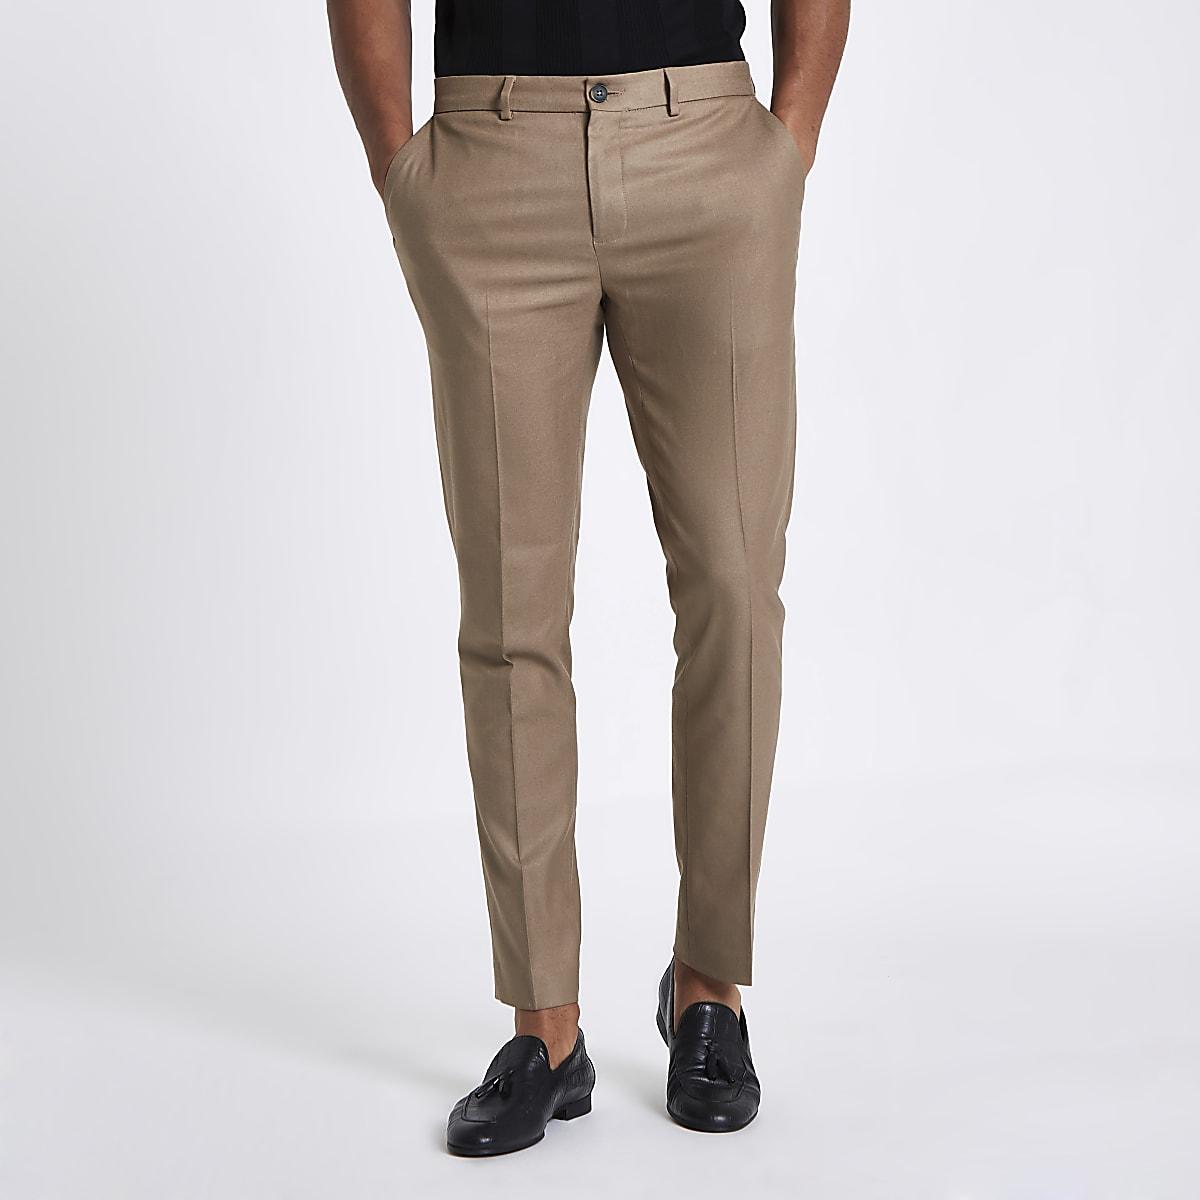 Tan skinny fit smart trousers